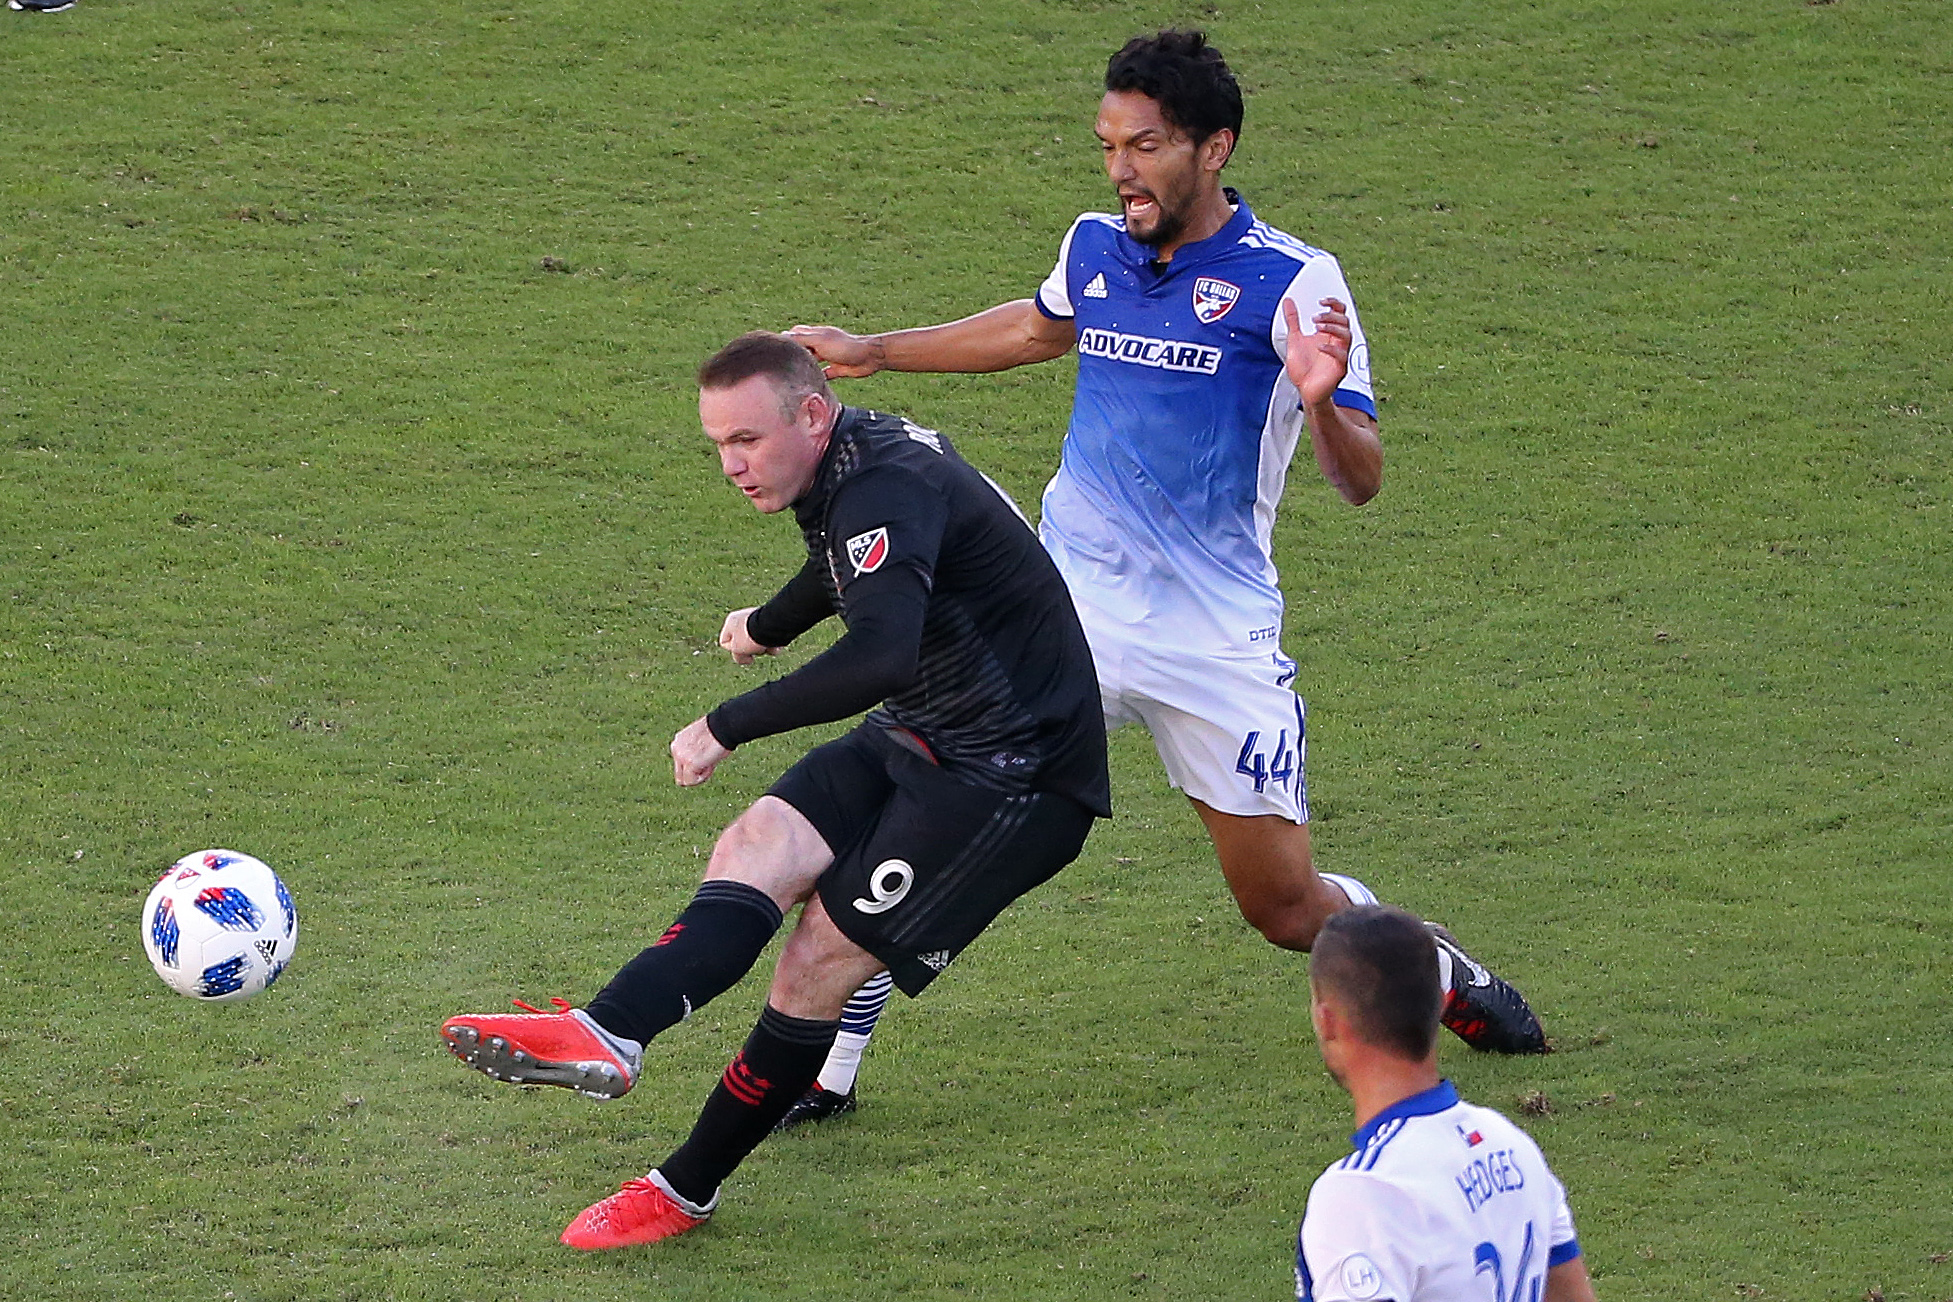 MLS - D.C. United - Wayne Rooney shoots the ball